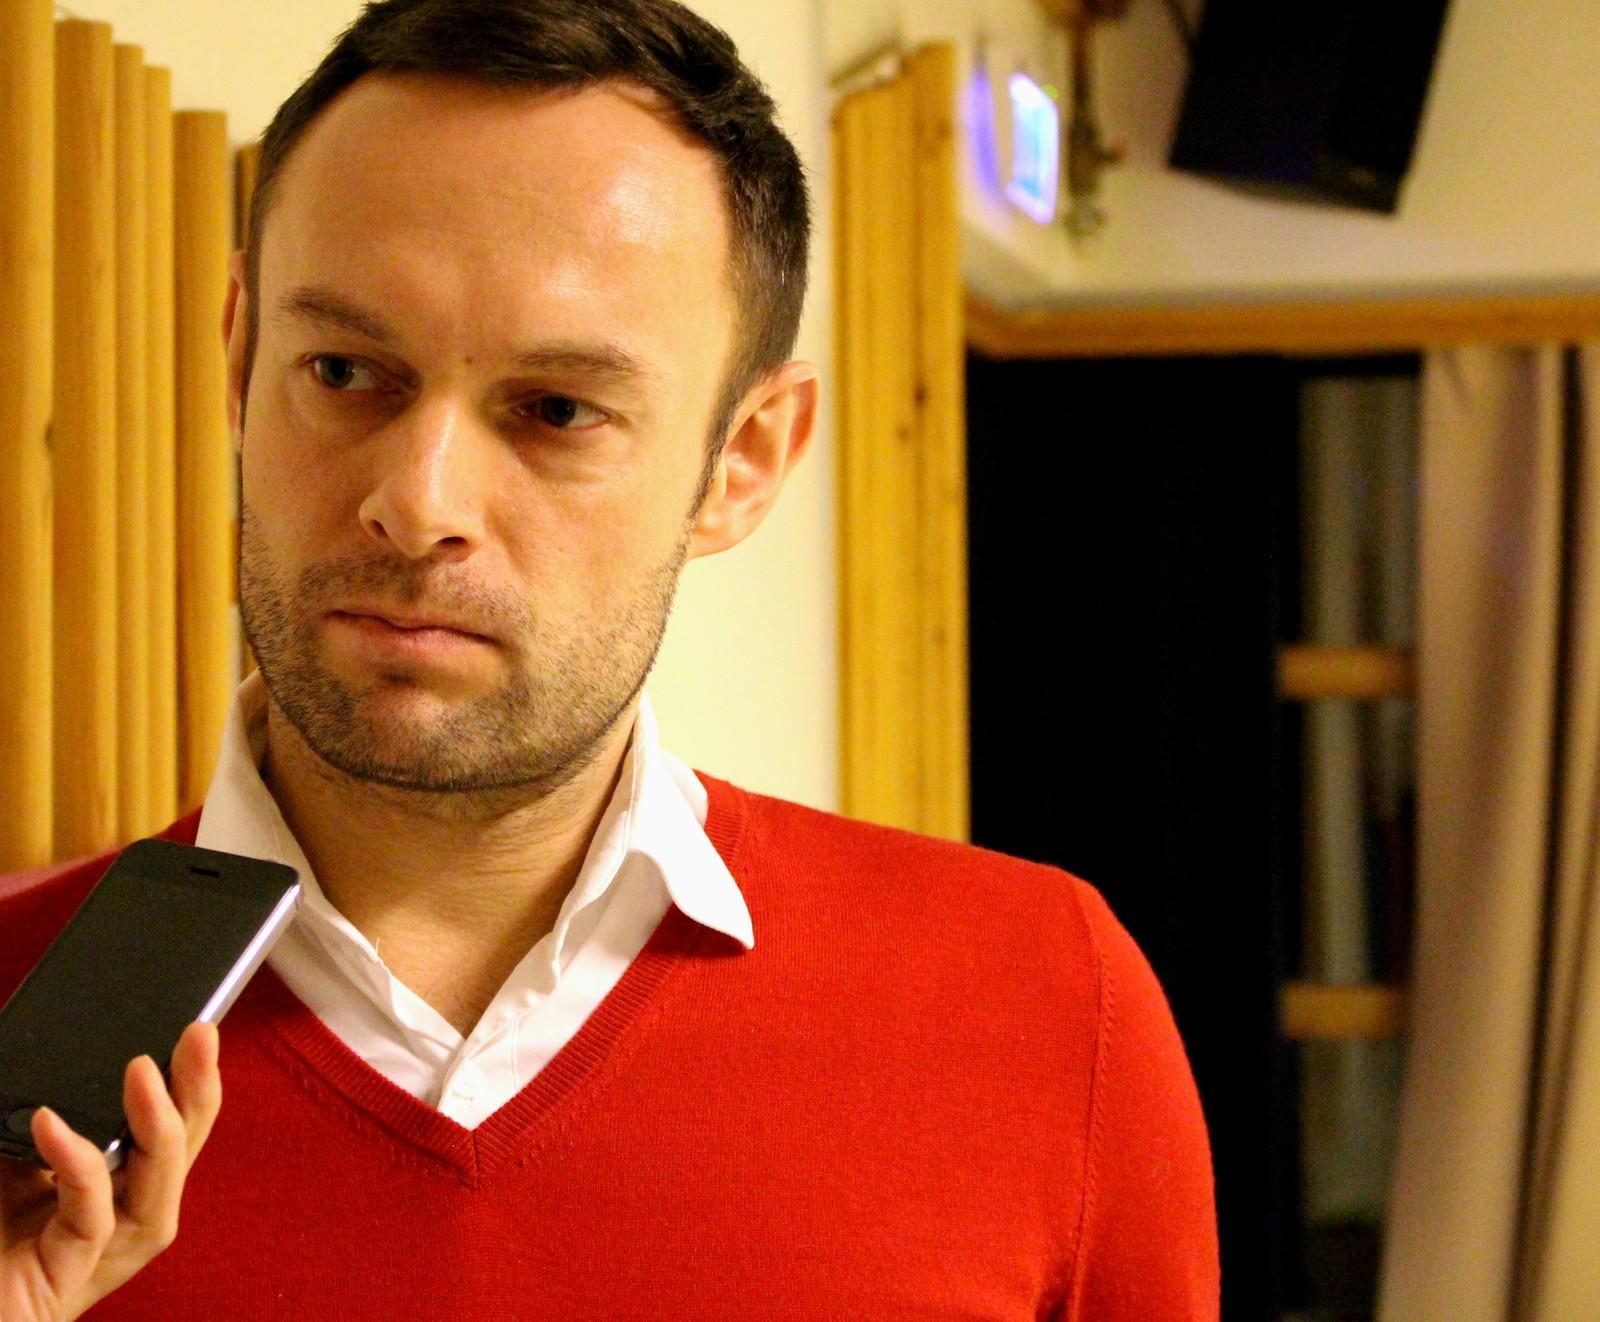 Torgeir blir intervjuet under et seminar i Alta i februar 2015.